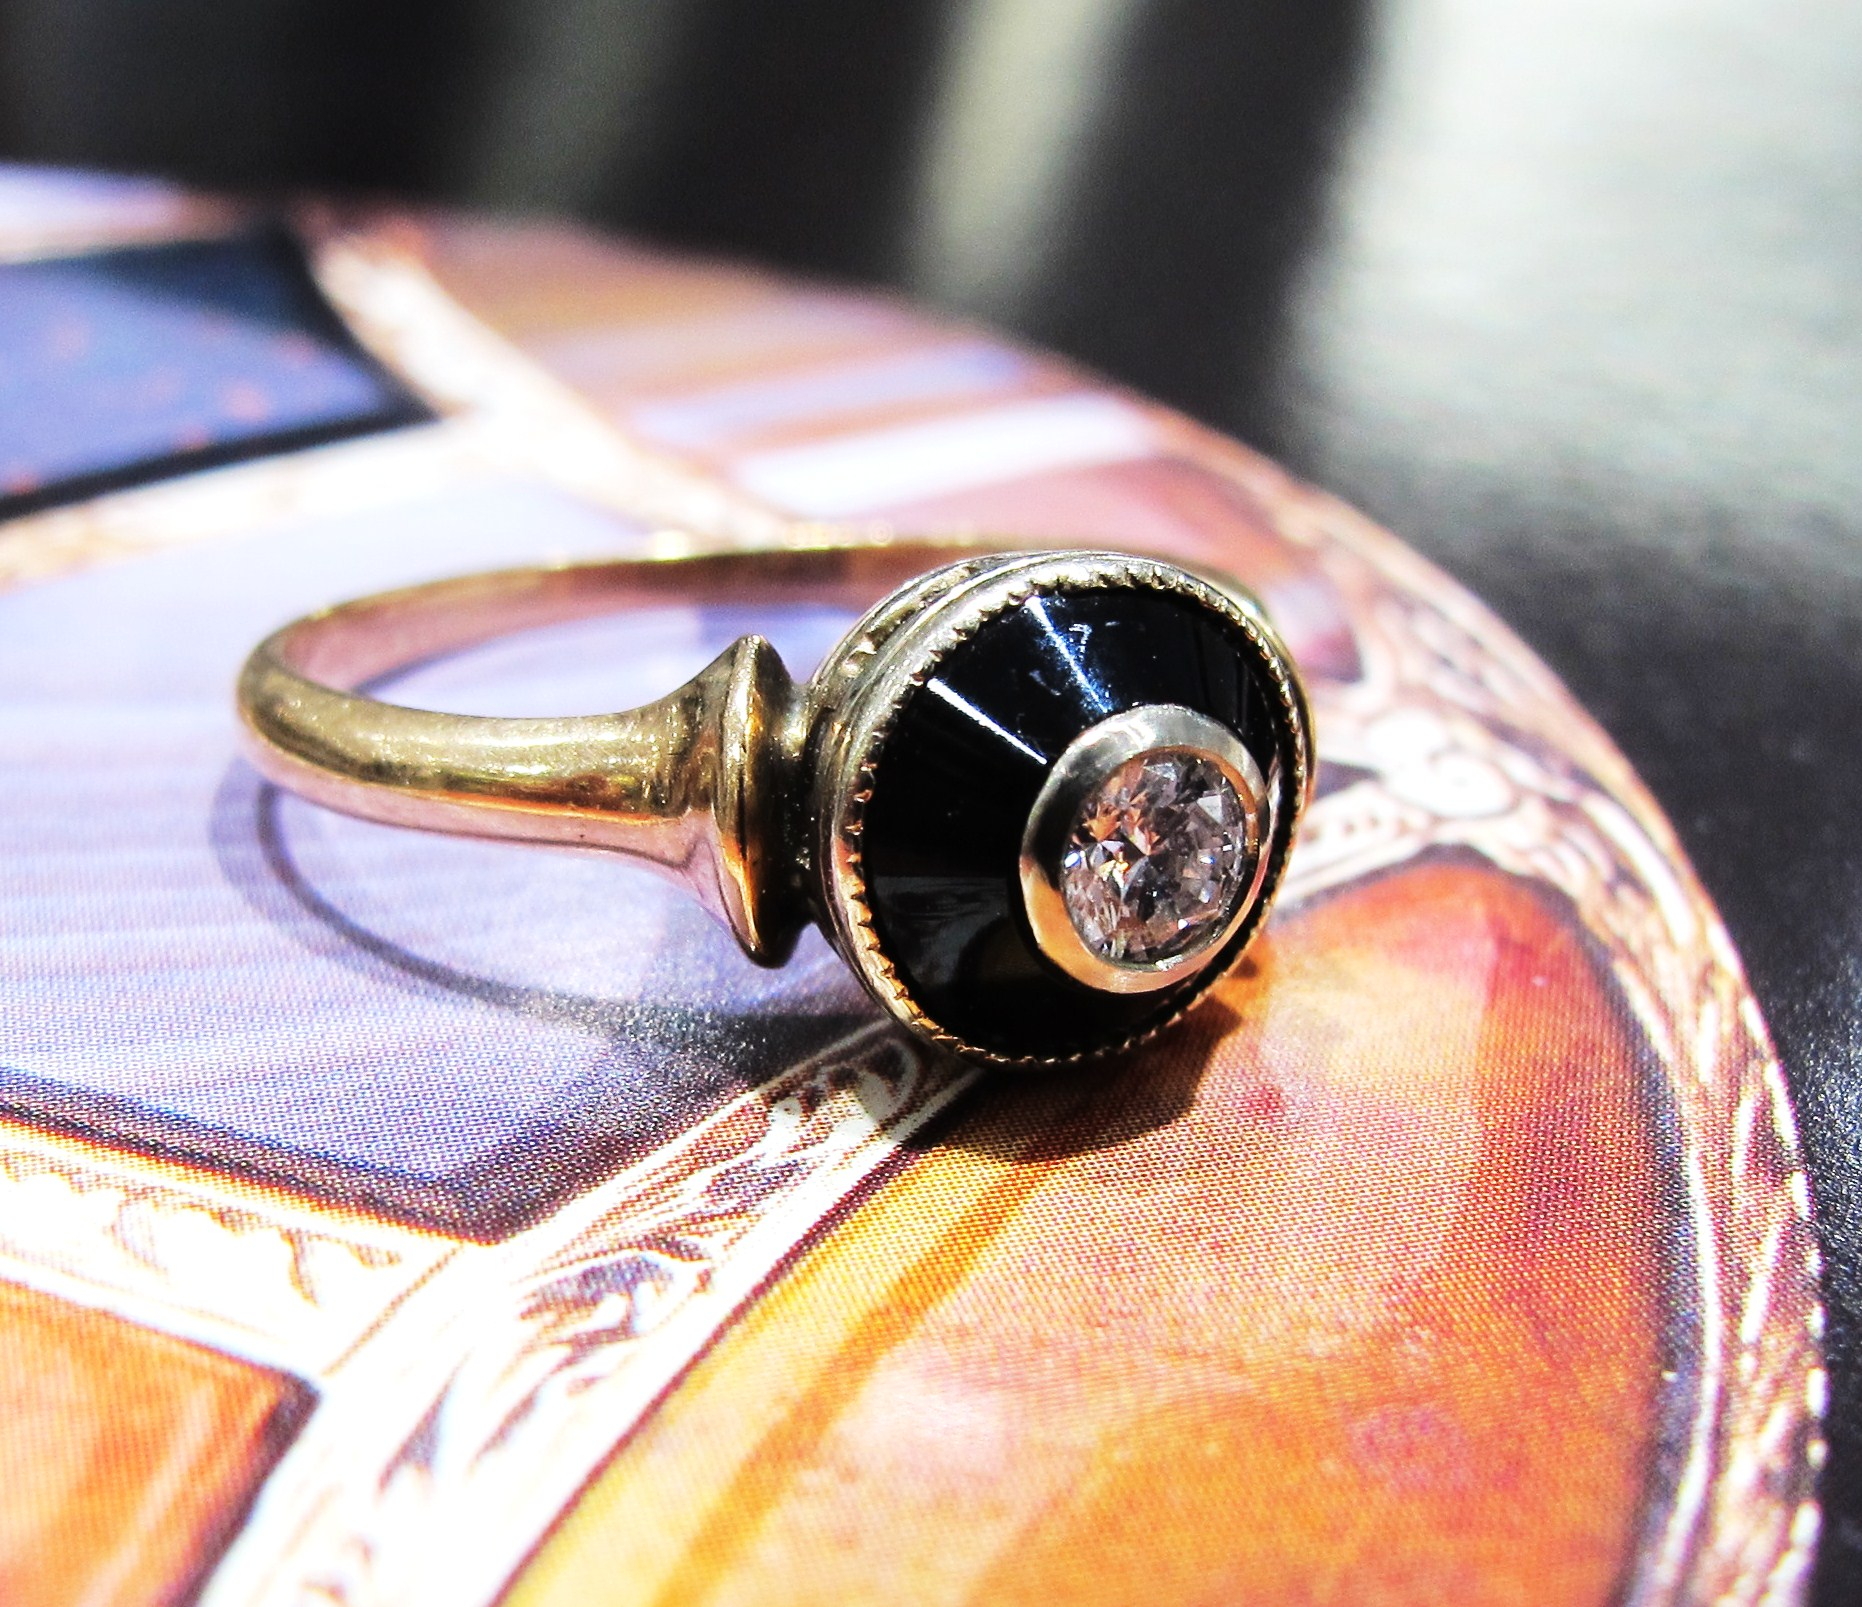 10k gold, onyx, .15ct old European cut diamond, c. late Victorian era